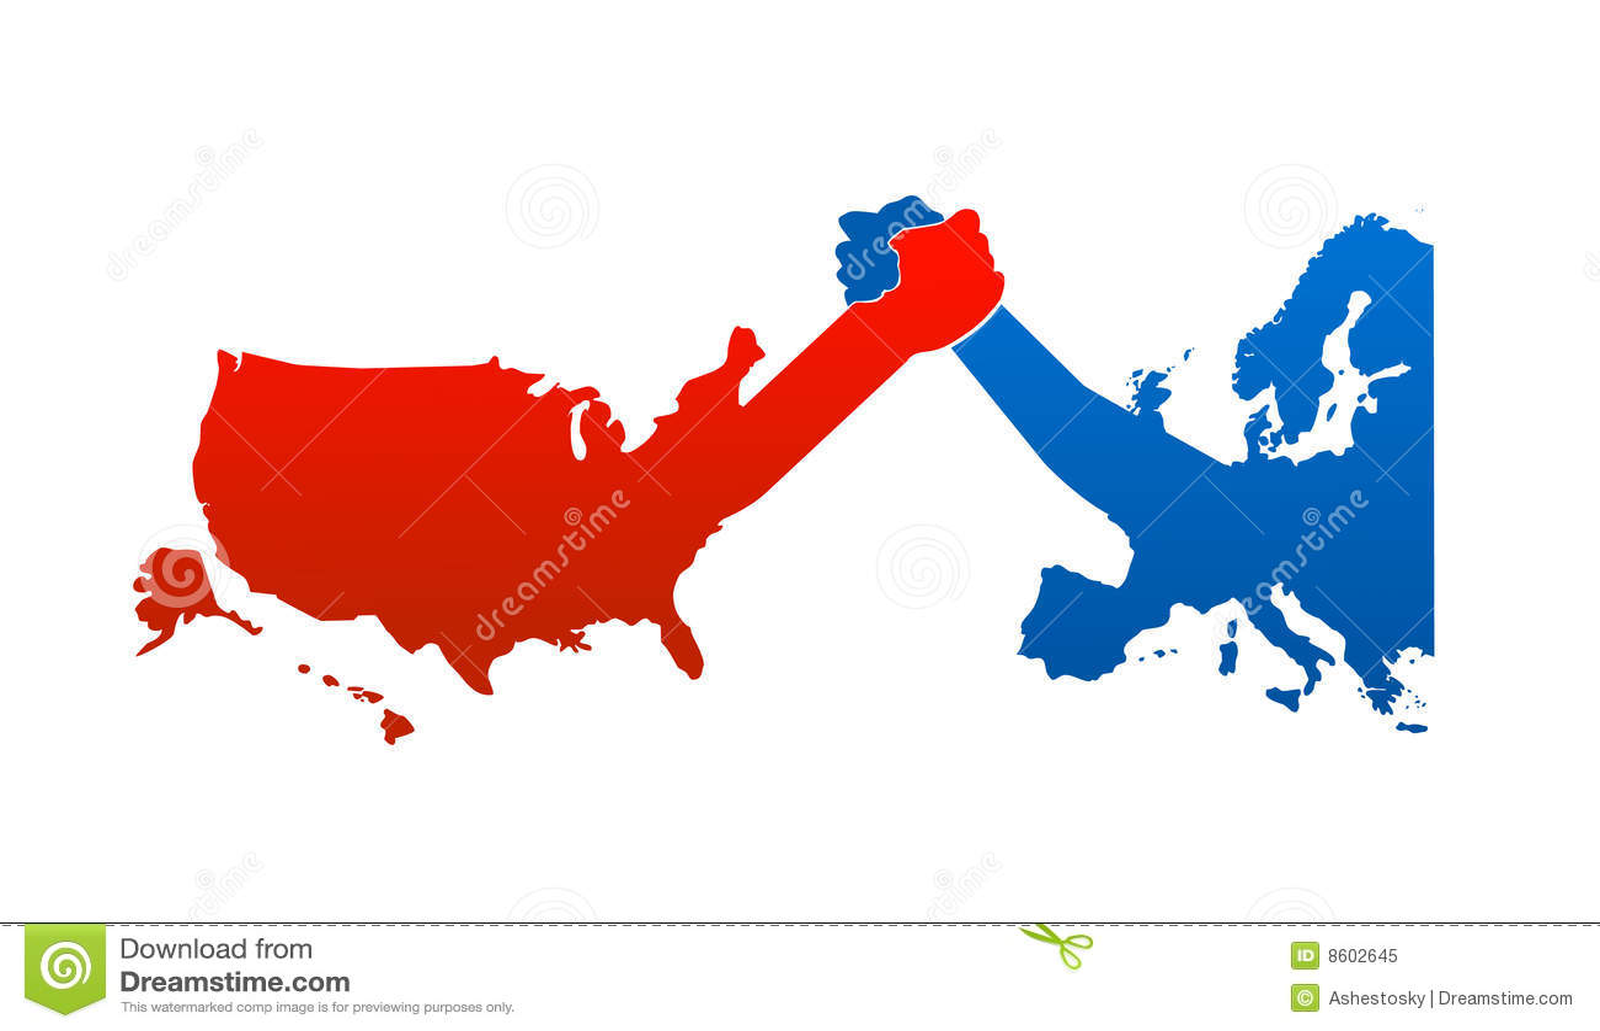 Verenigde Staten Tegenover Europa Vector Illustratie